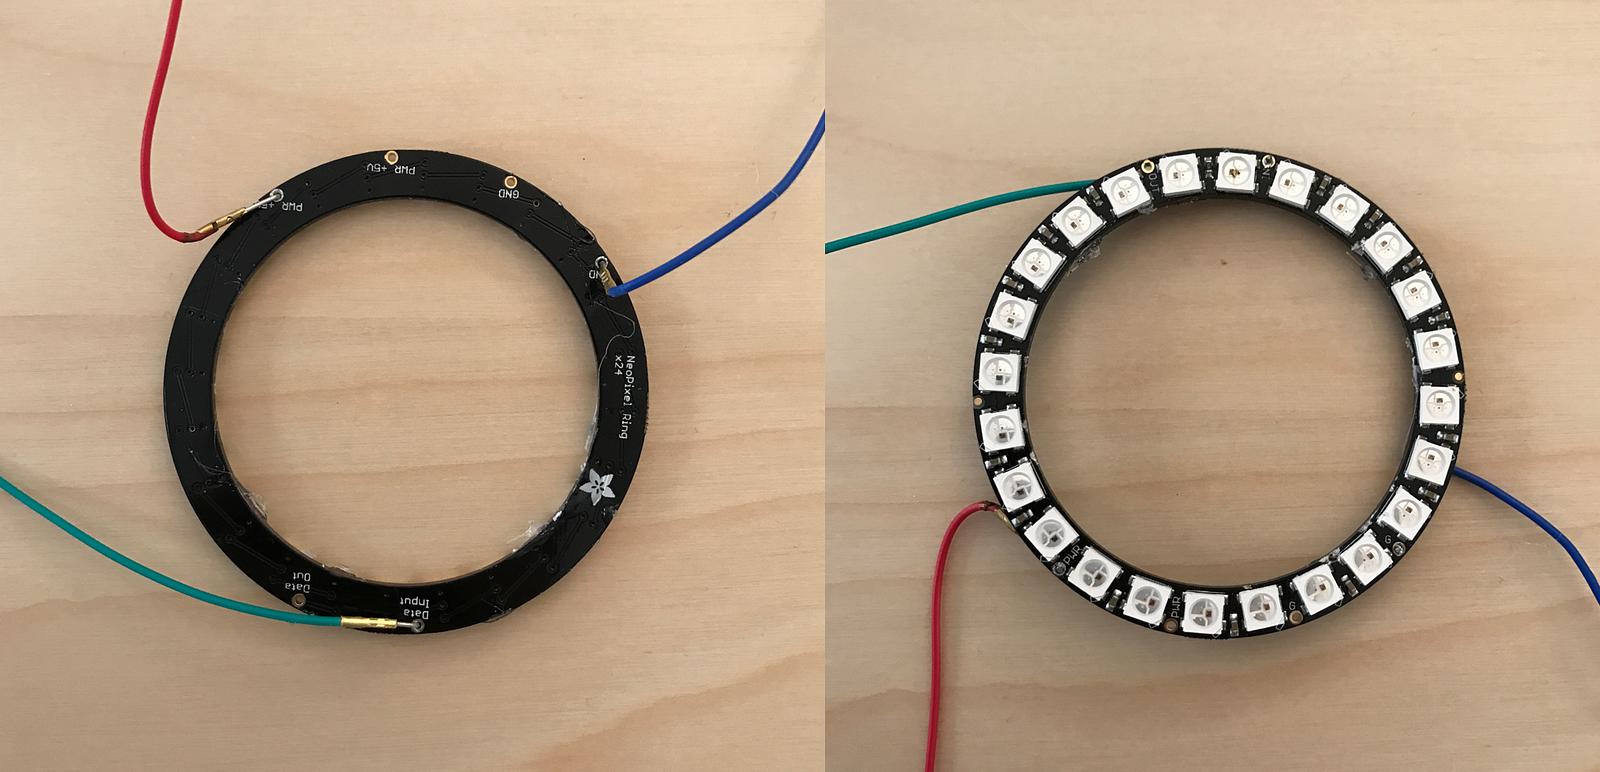 GitHub - snipsco/snips-skill-neopixel: NeoPixel Ring 24